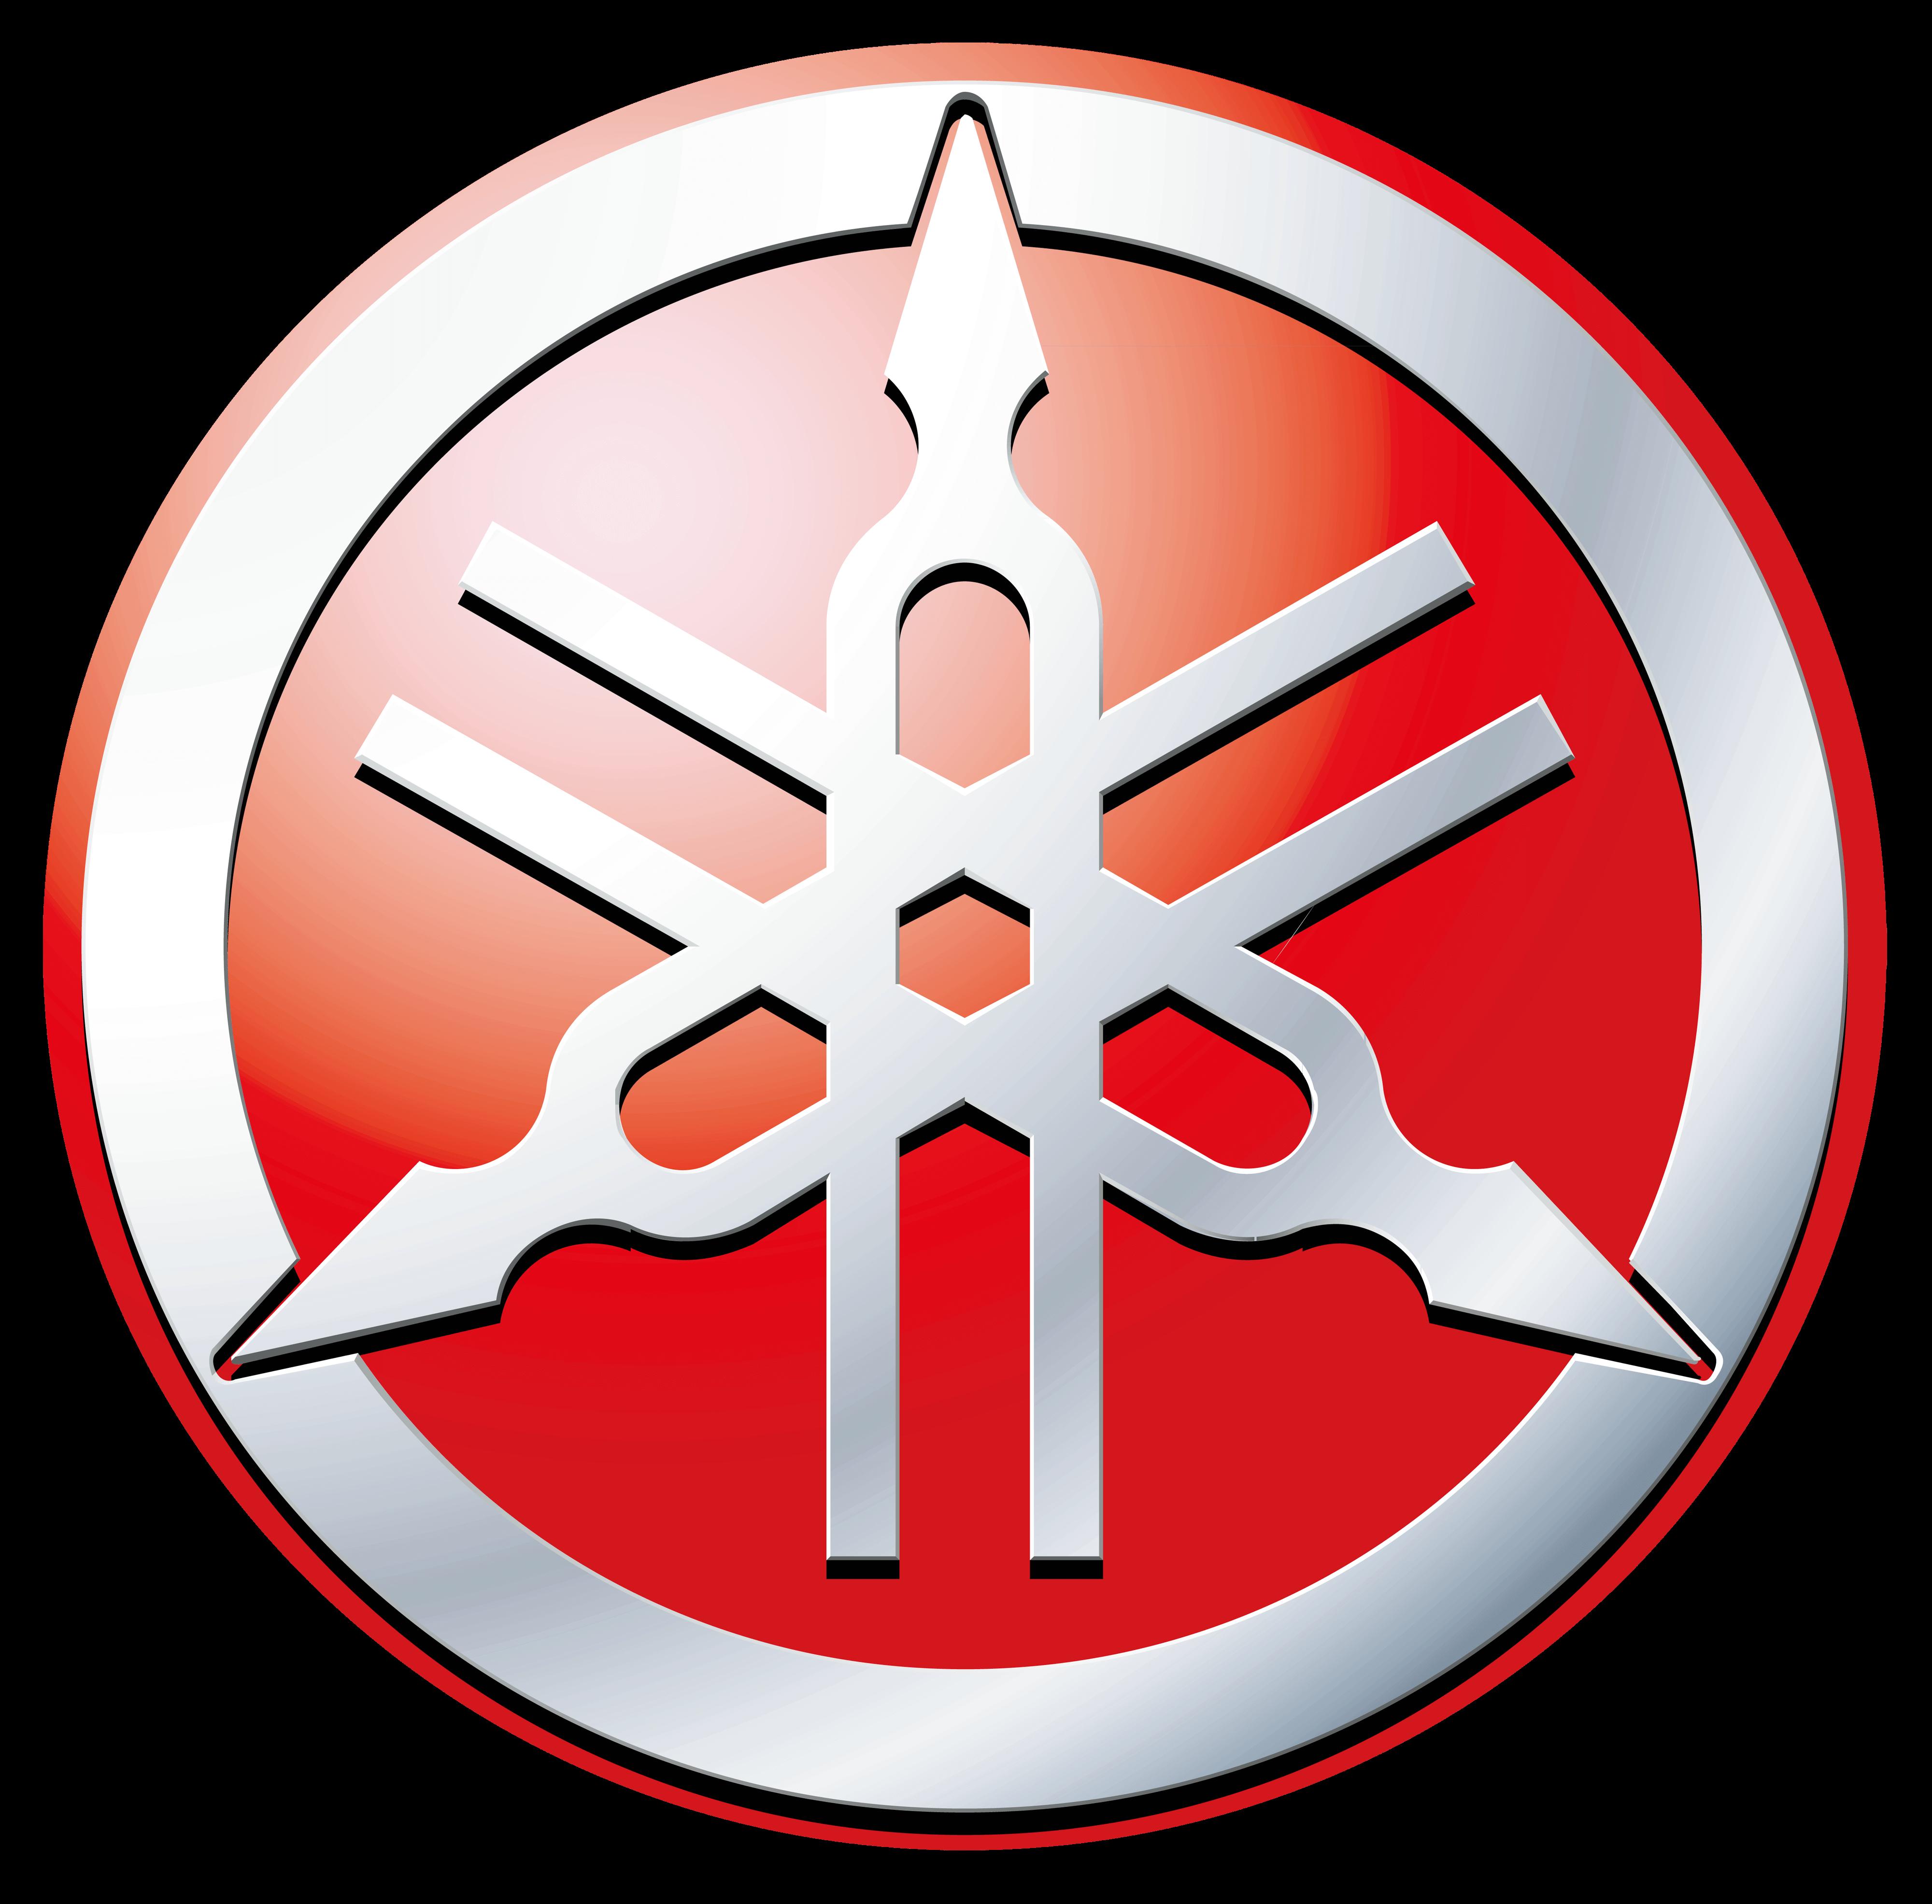 Yamaha logo red logos. Motorcycle clipart motorcycle burnout